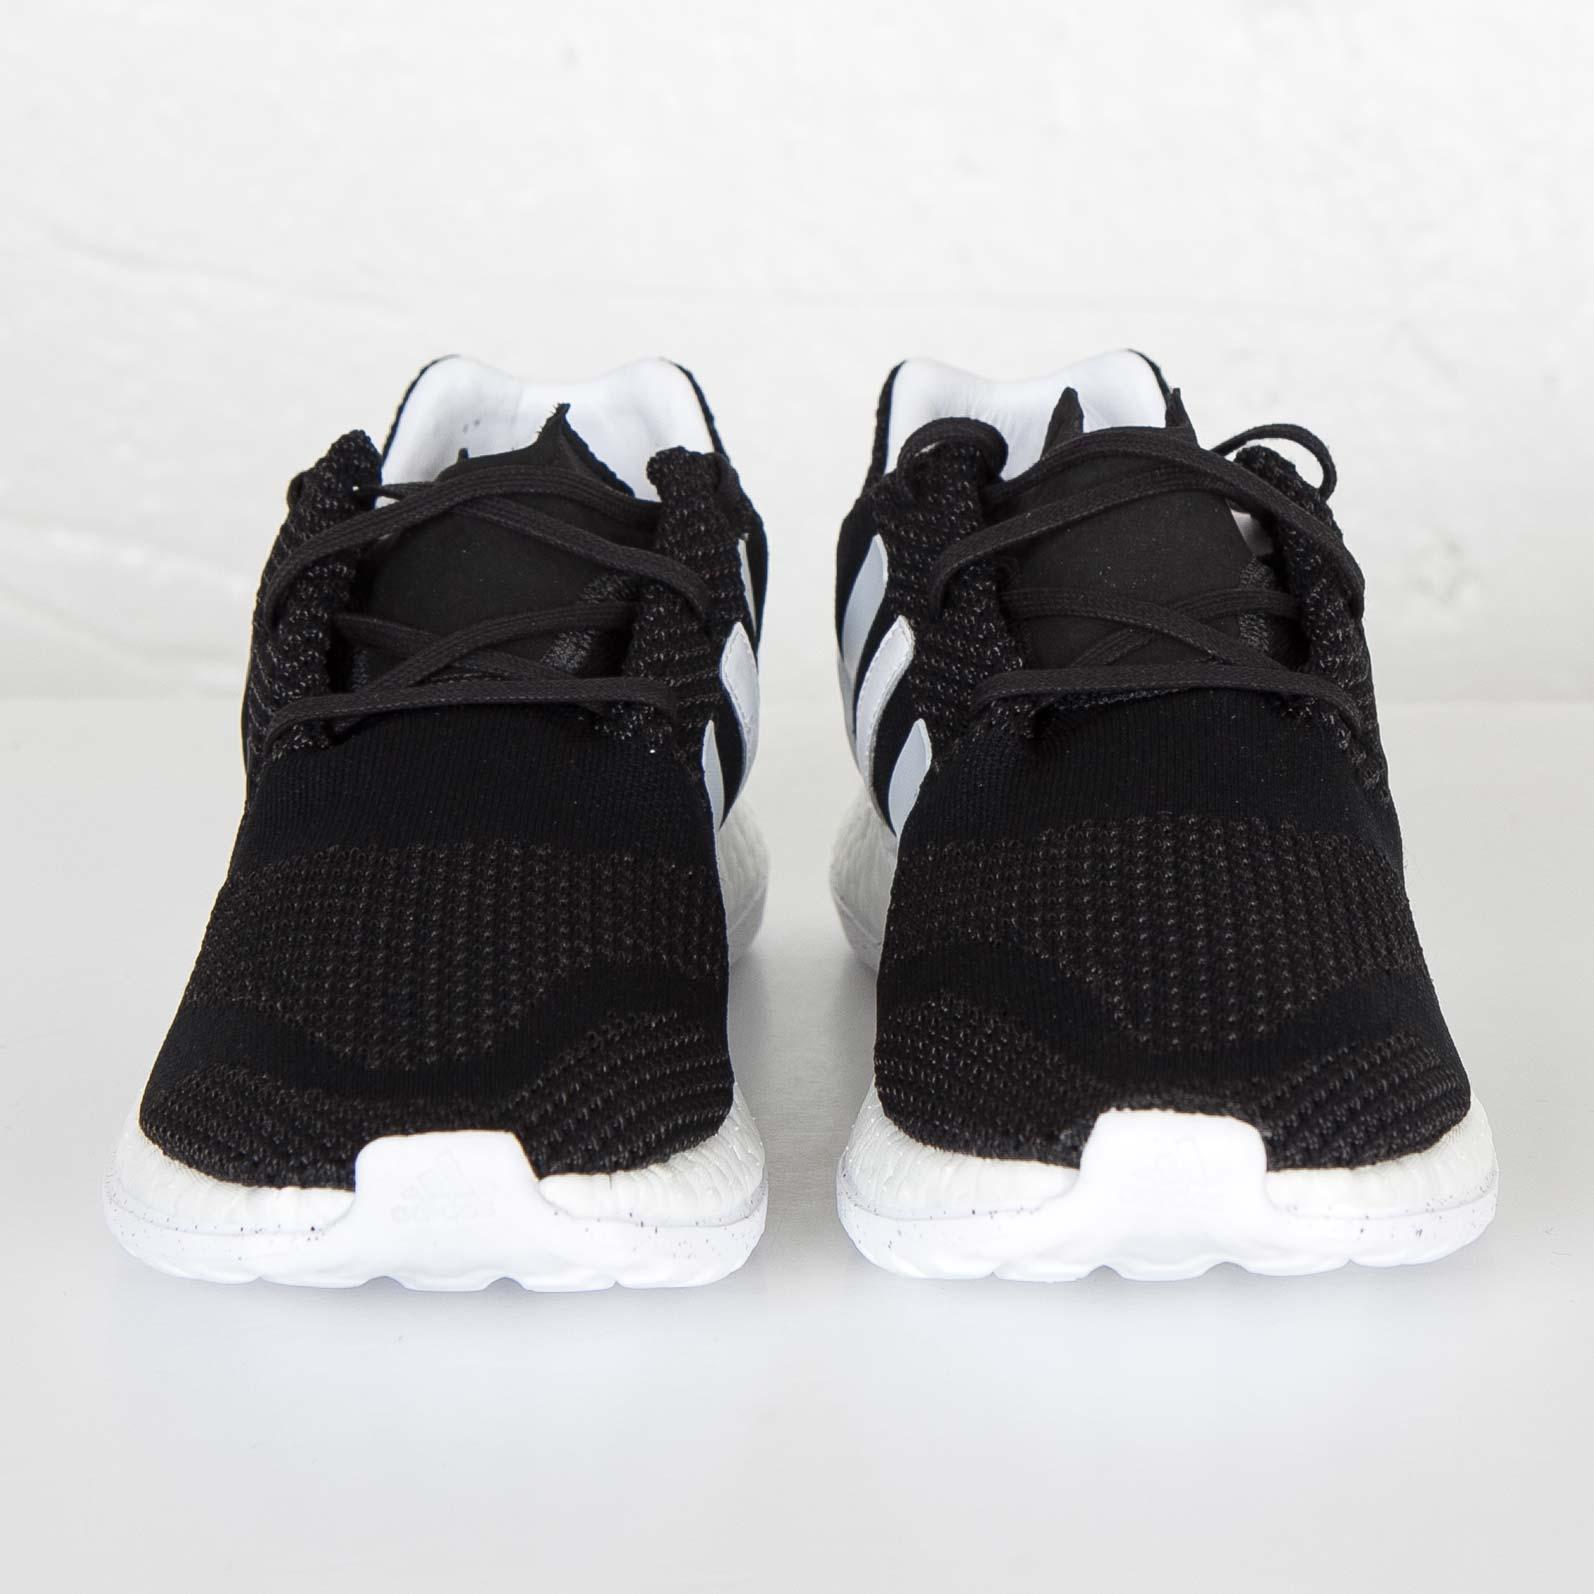 1a904fb2b21bc adidas Y-3 Pure Boost ZG Knit - Aq5729 - Sneakersnstuff